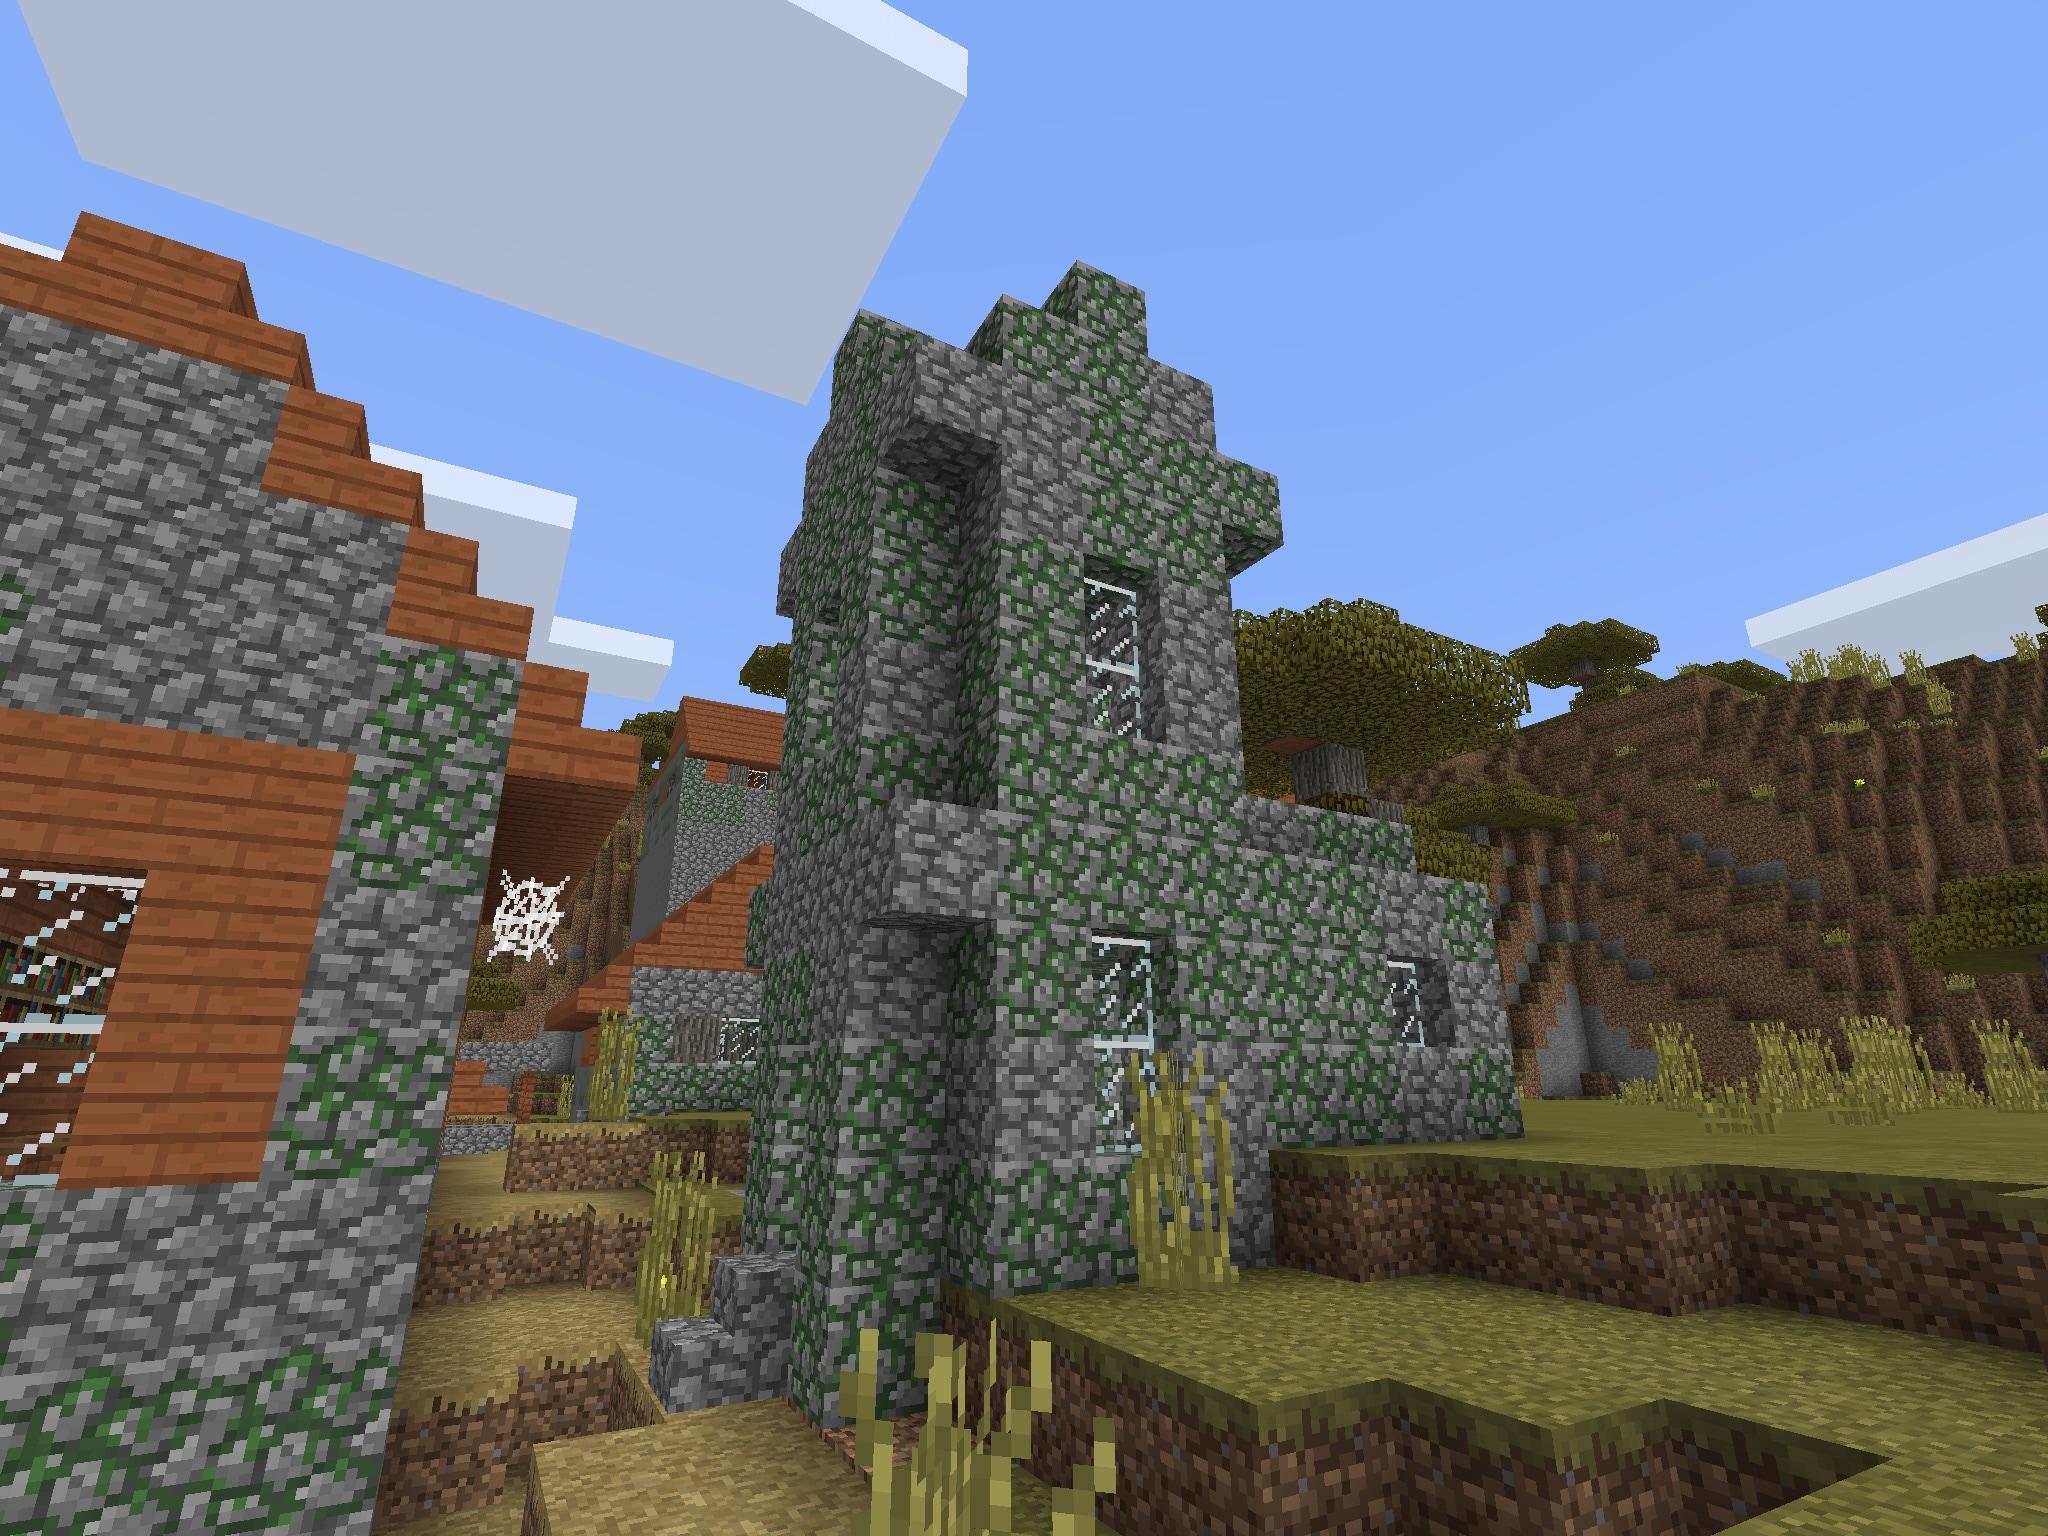 Zombie Village MCPE Seed